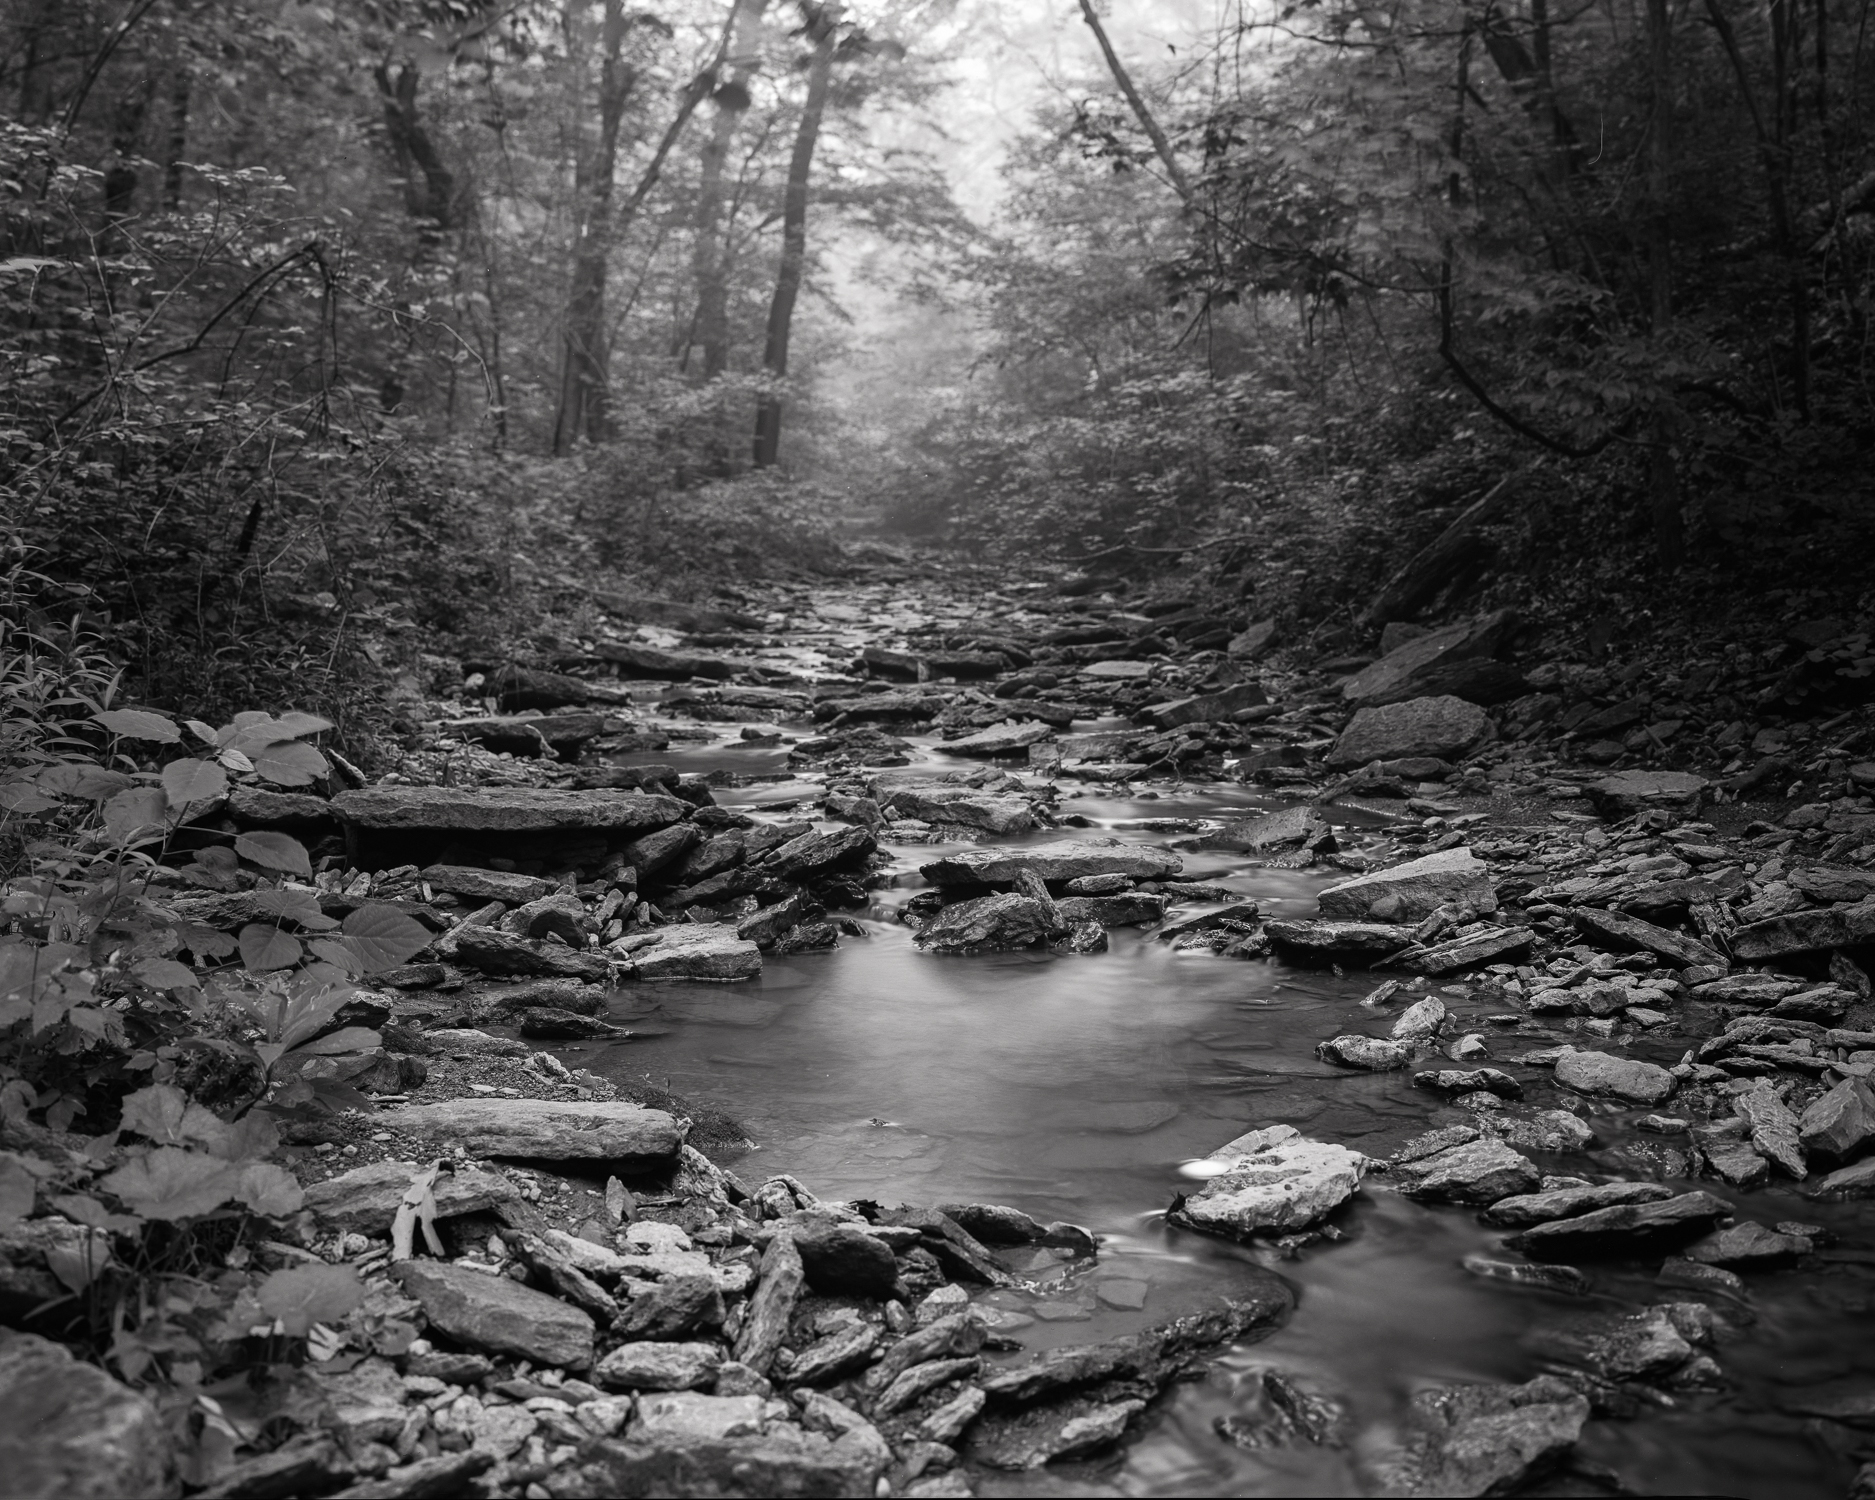 Falls_Creek_005.jpg